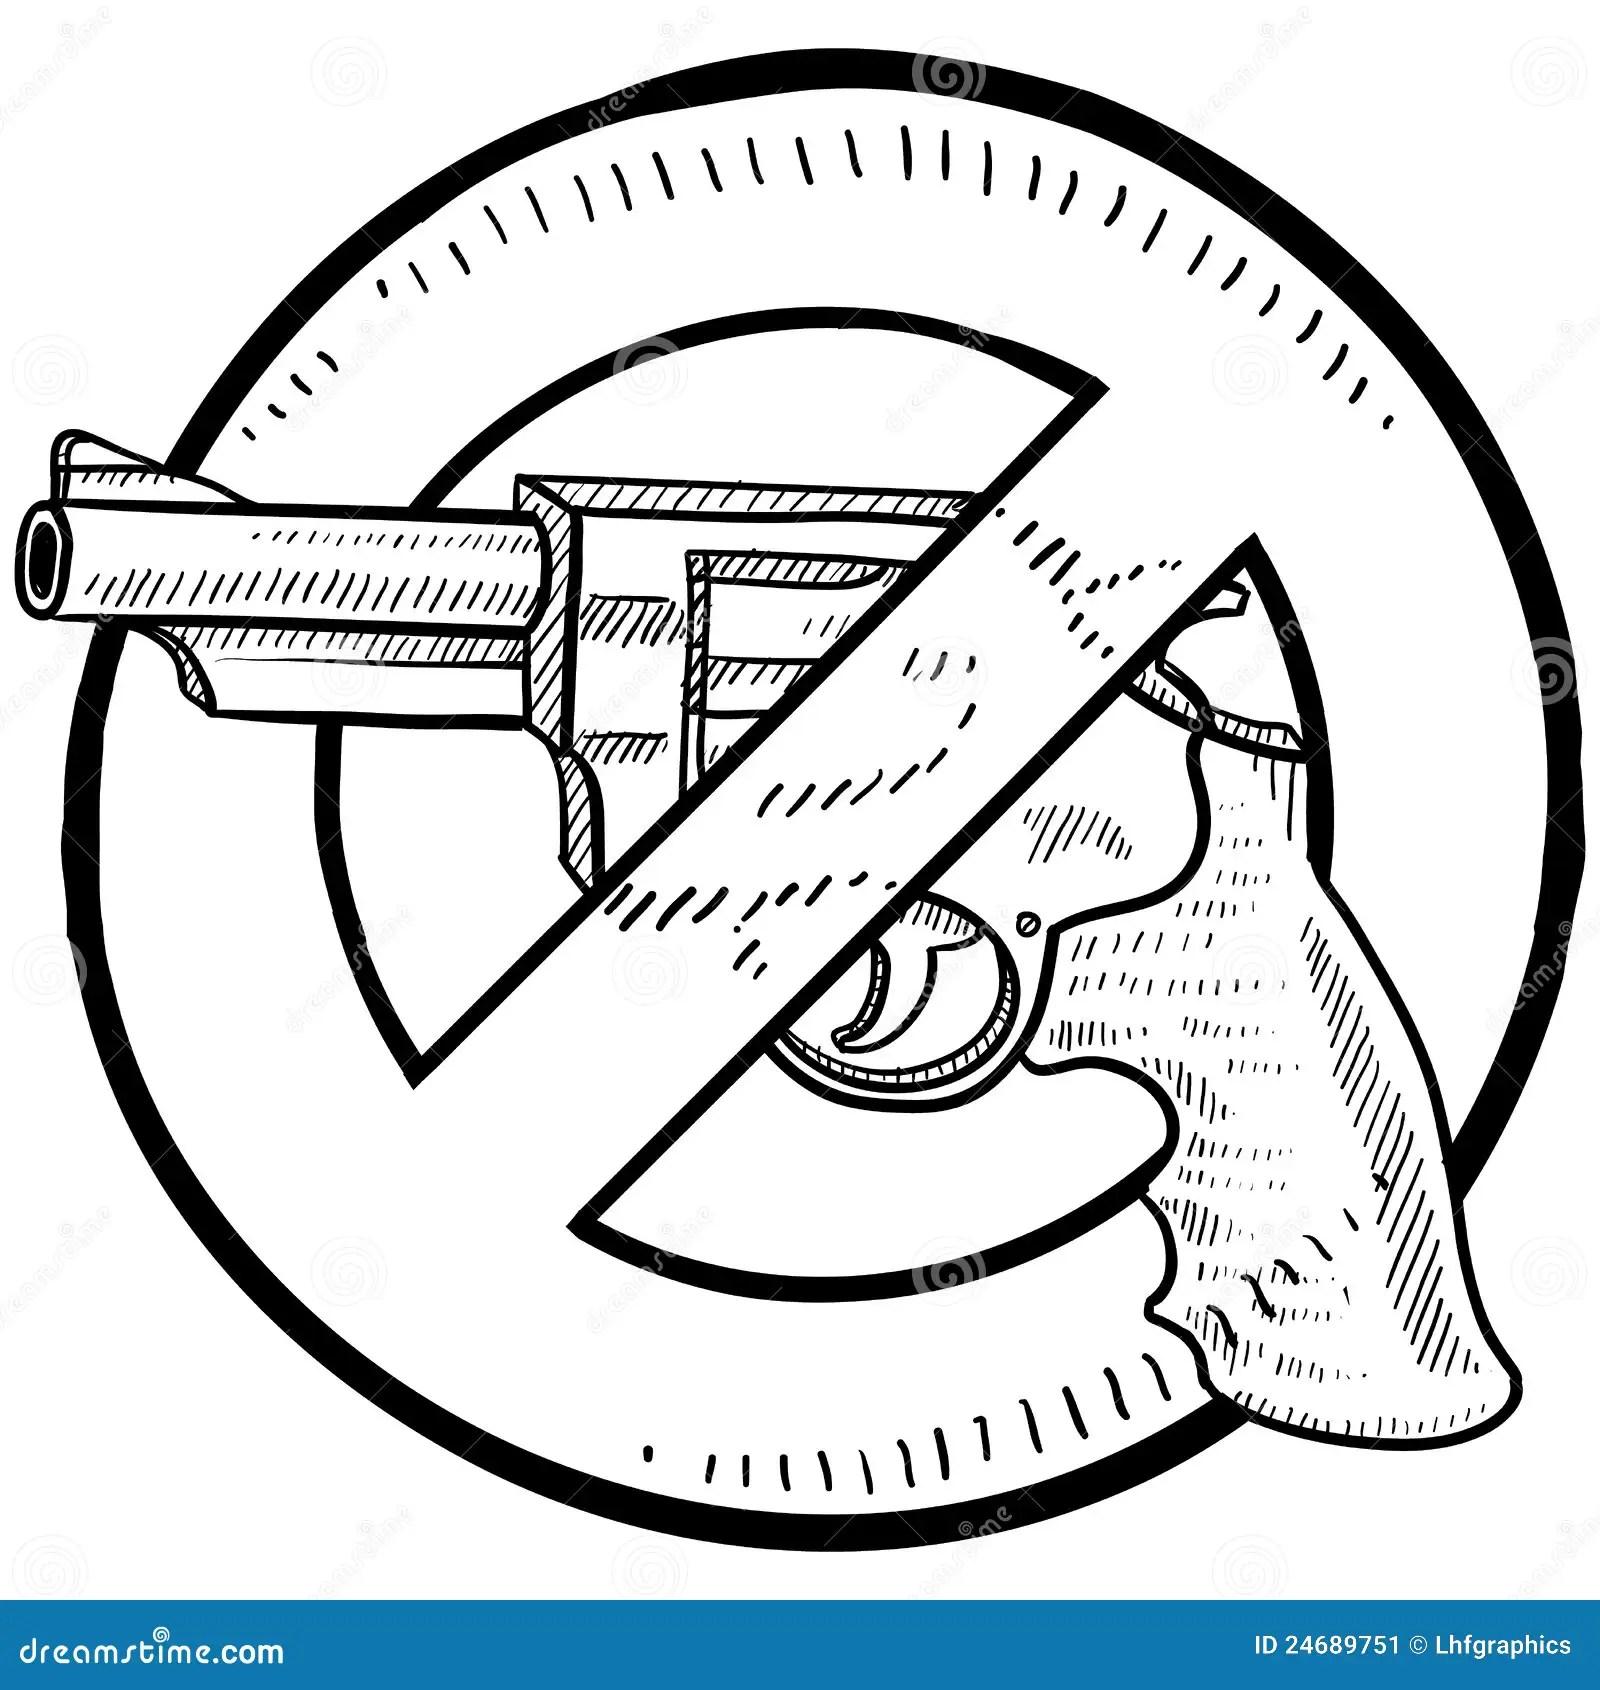 Gun Control Sketch Stock Vector Illustration Of Illegal